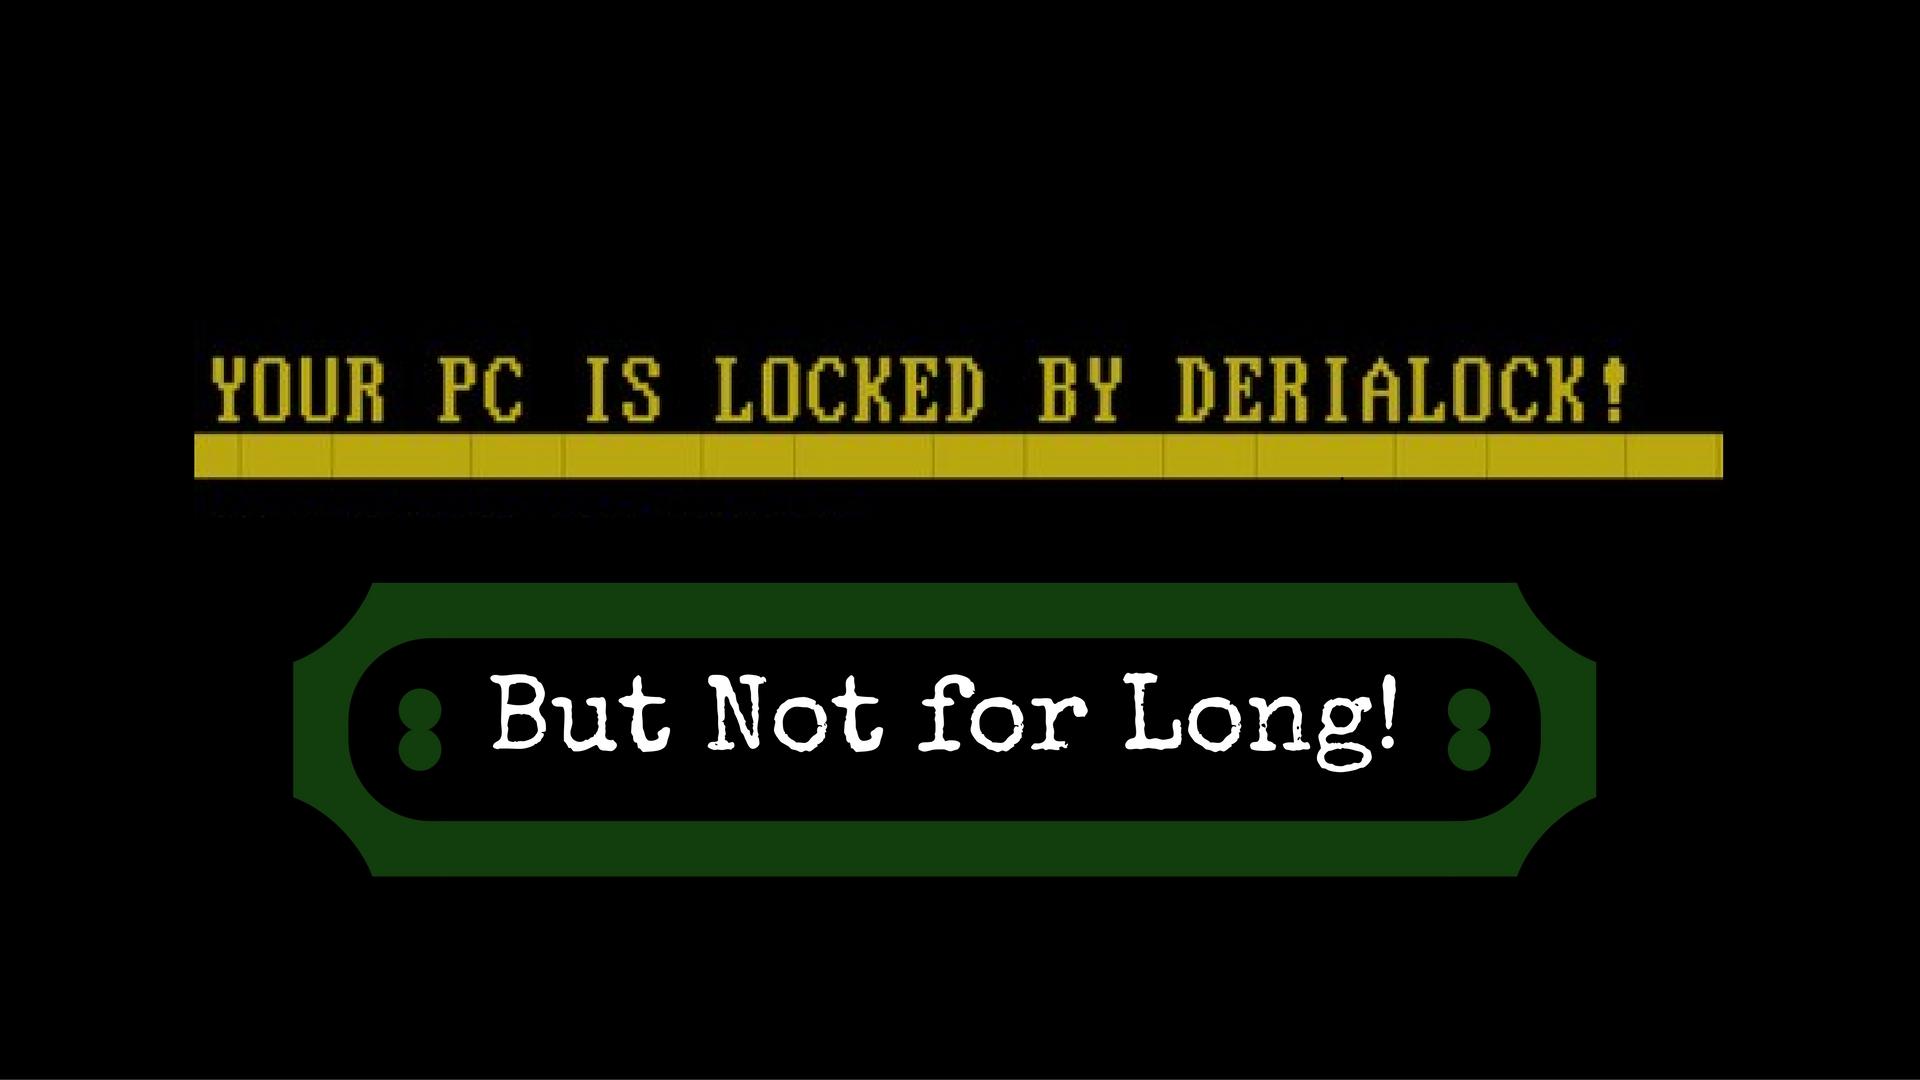 derialock-screen-locker-ransomware-bestsecuritysearch